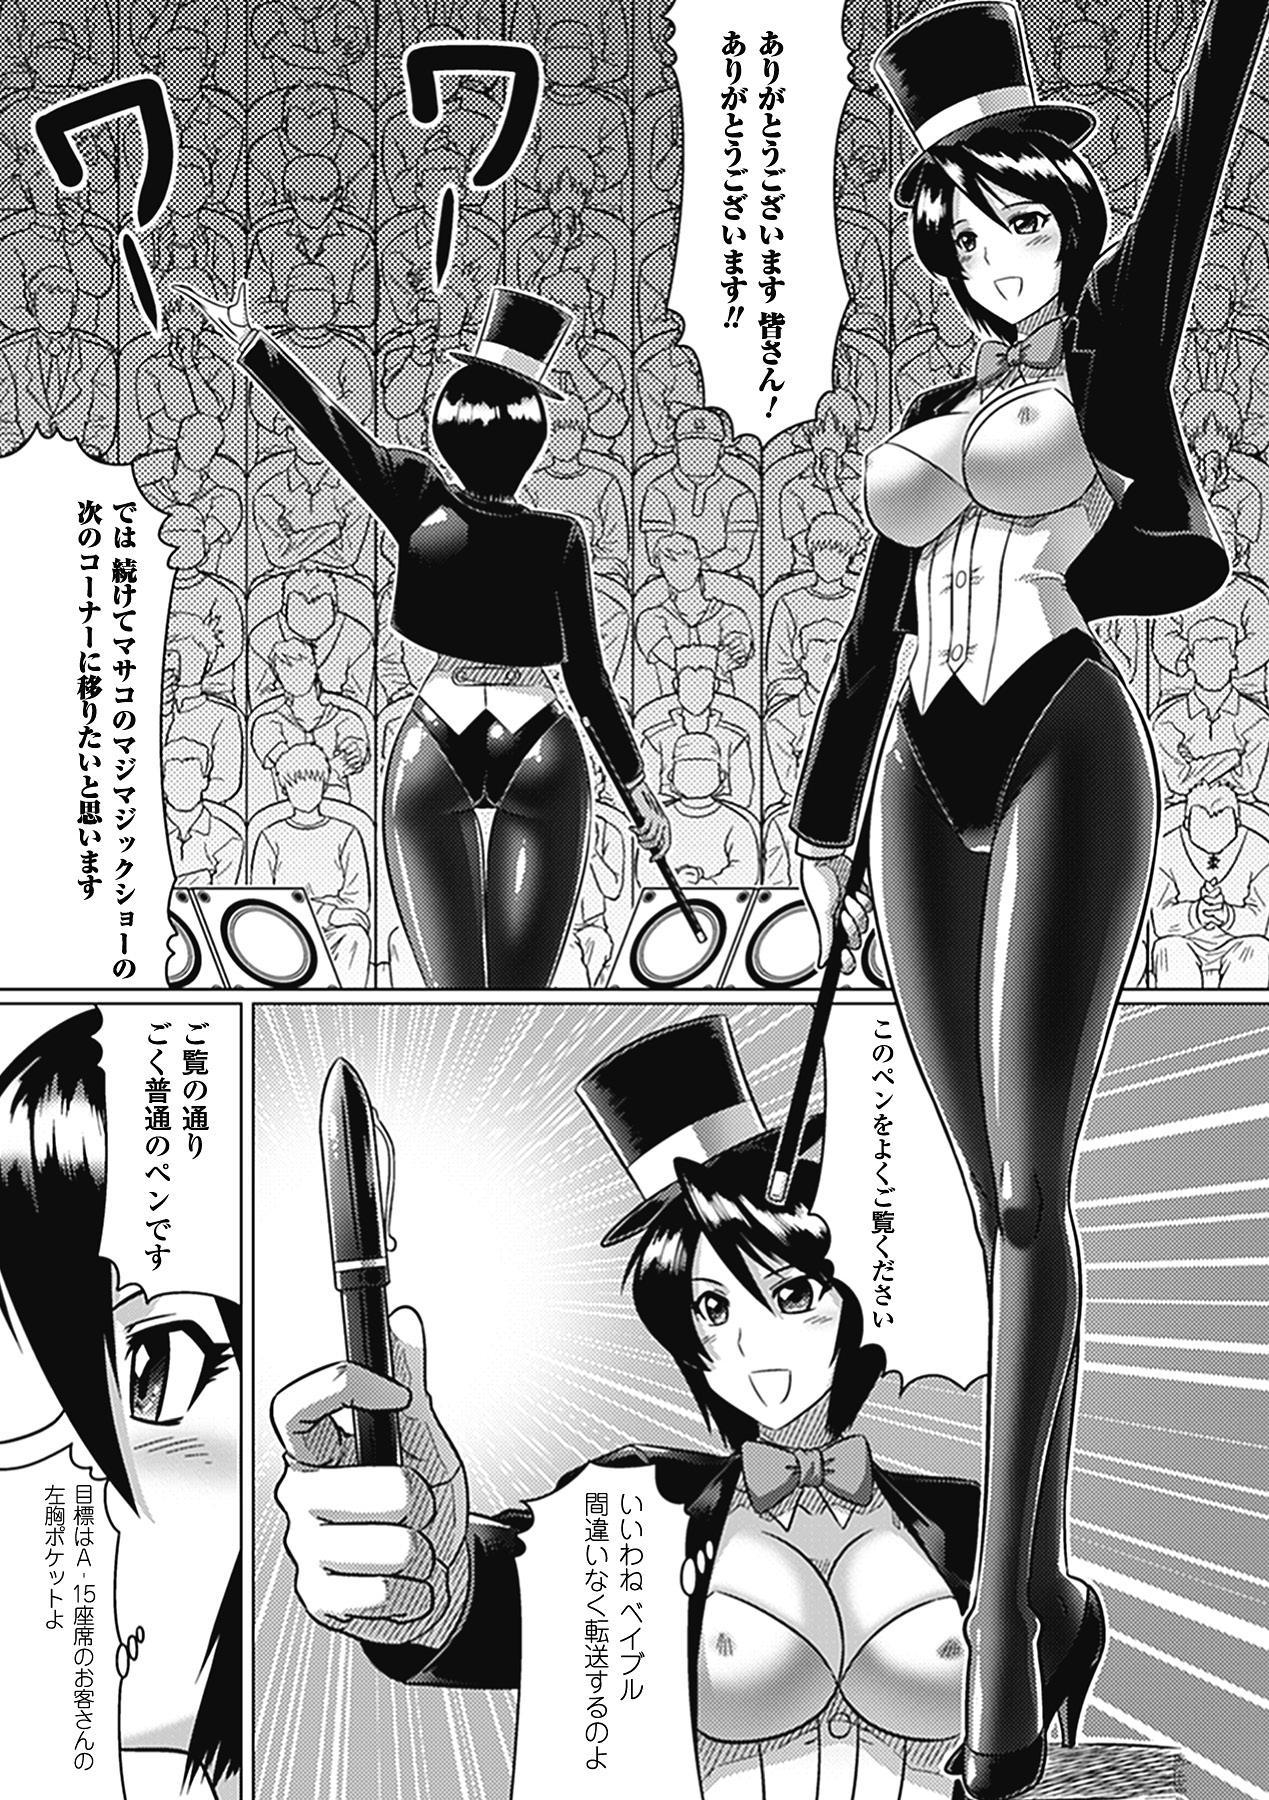 Megami Crisis 1 144